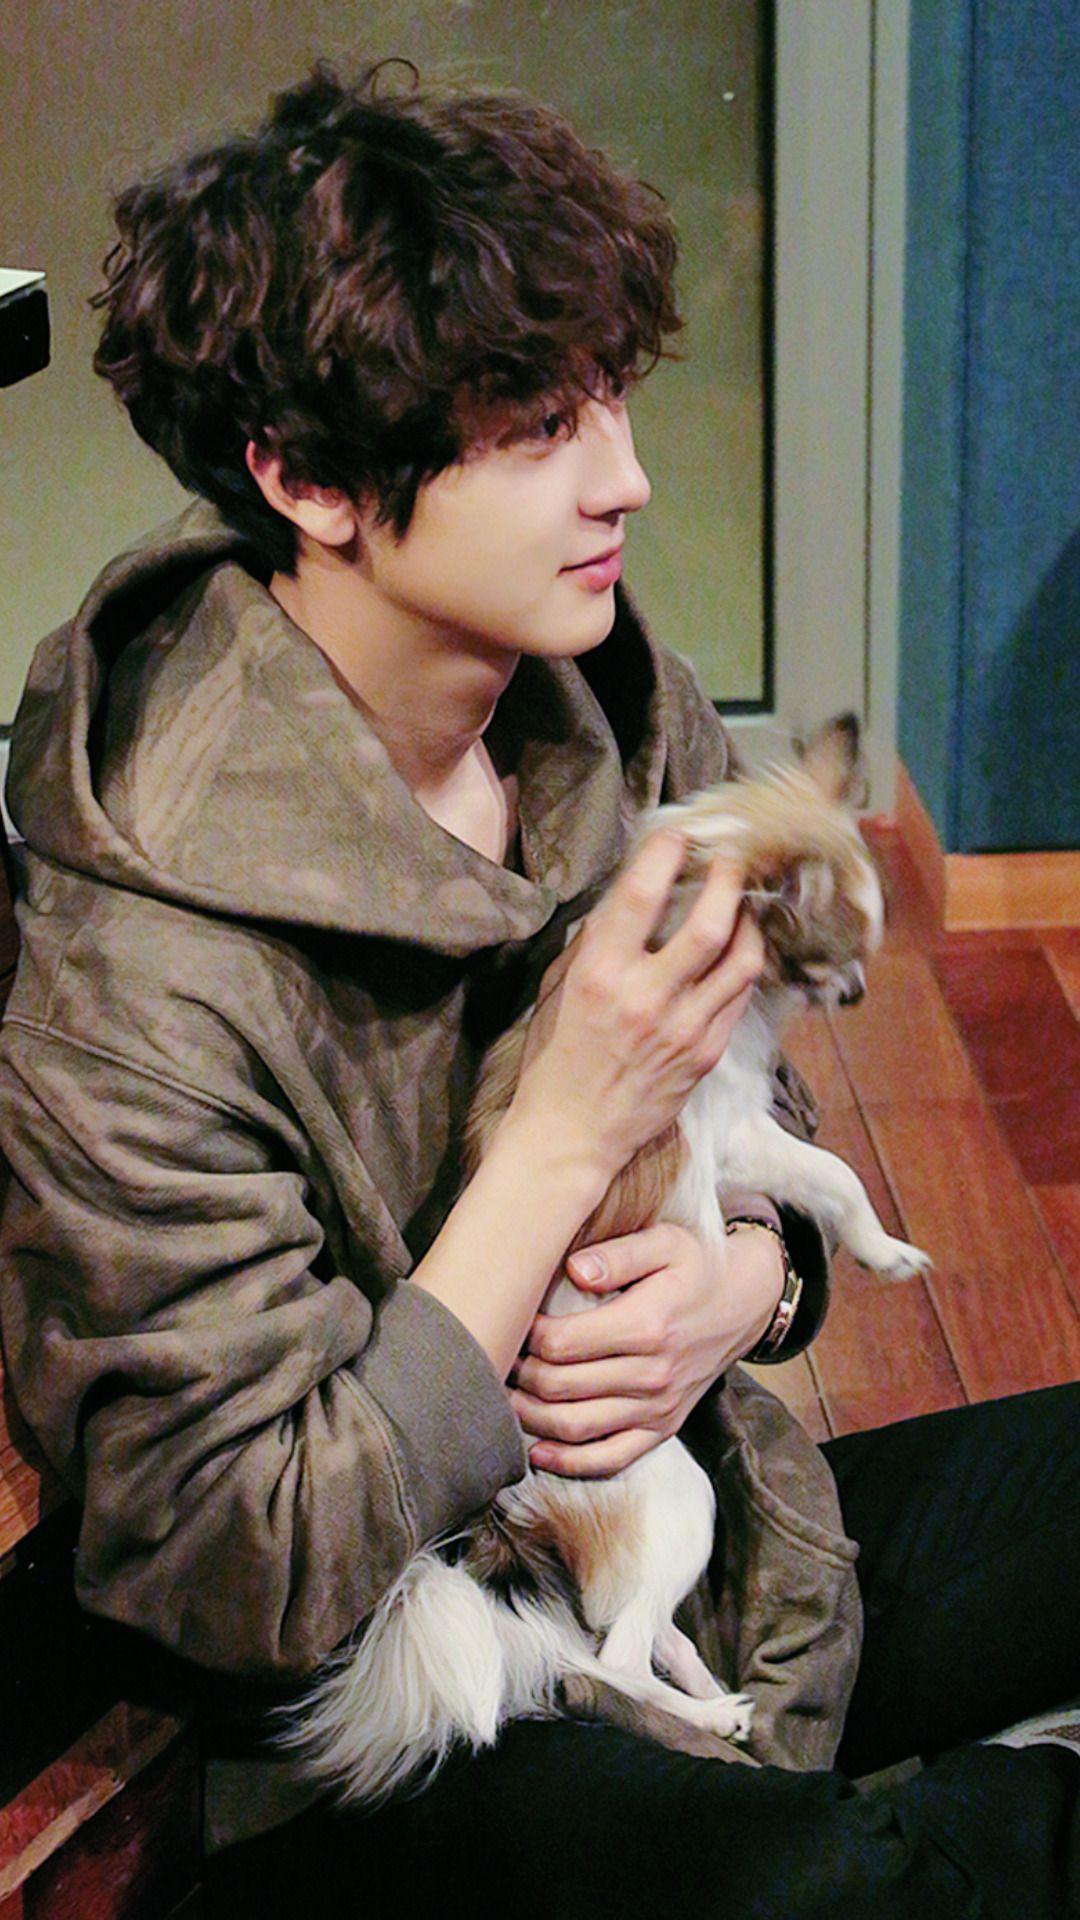 Boyfriend Material Kpop Tumblr Selebritas Baekhyun Chanyeol